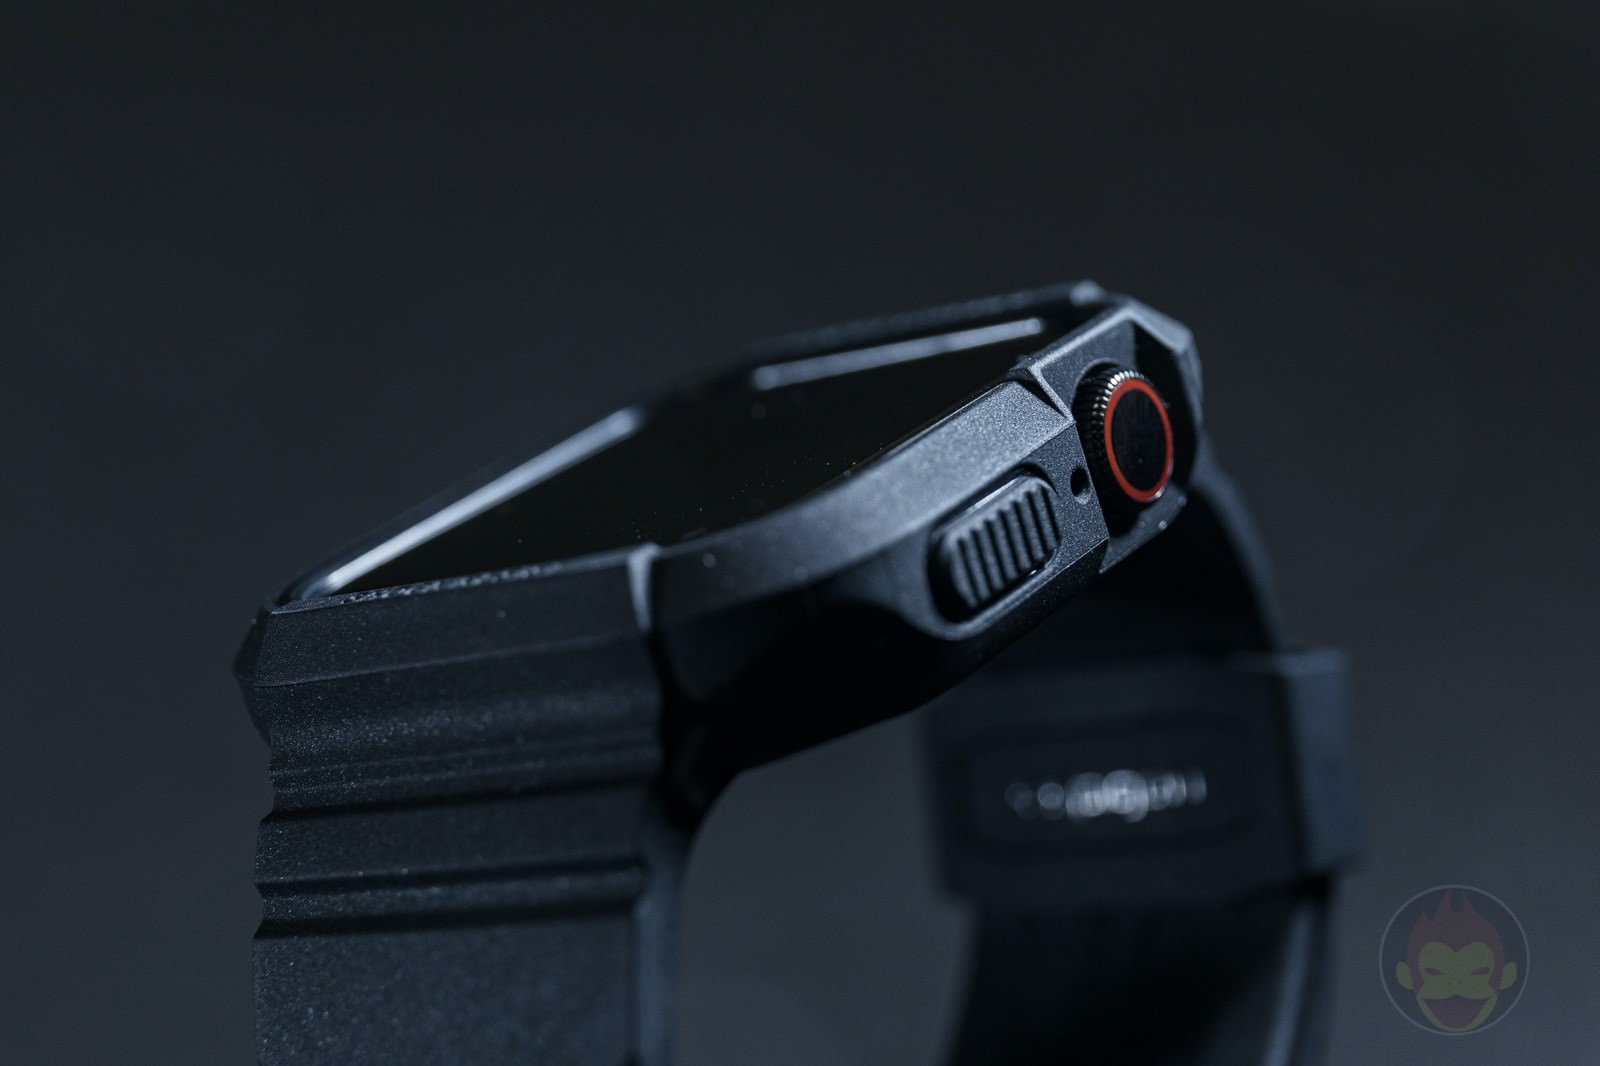 Spigen-Rugged-Armor-Pro-Apple-Watch-Band-and-case-11.jpg